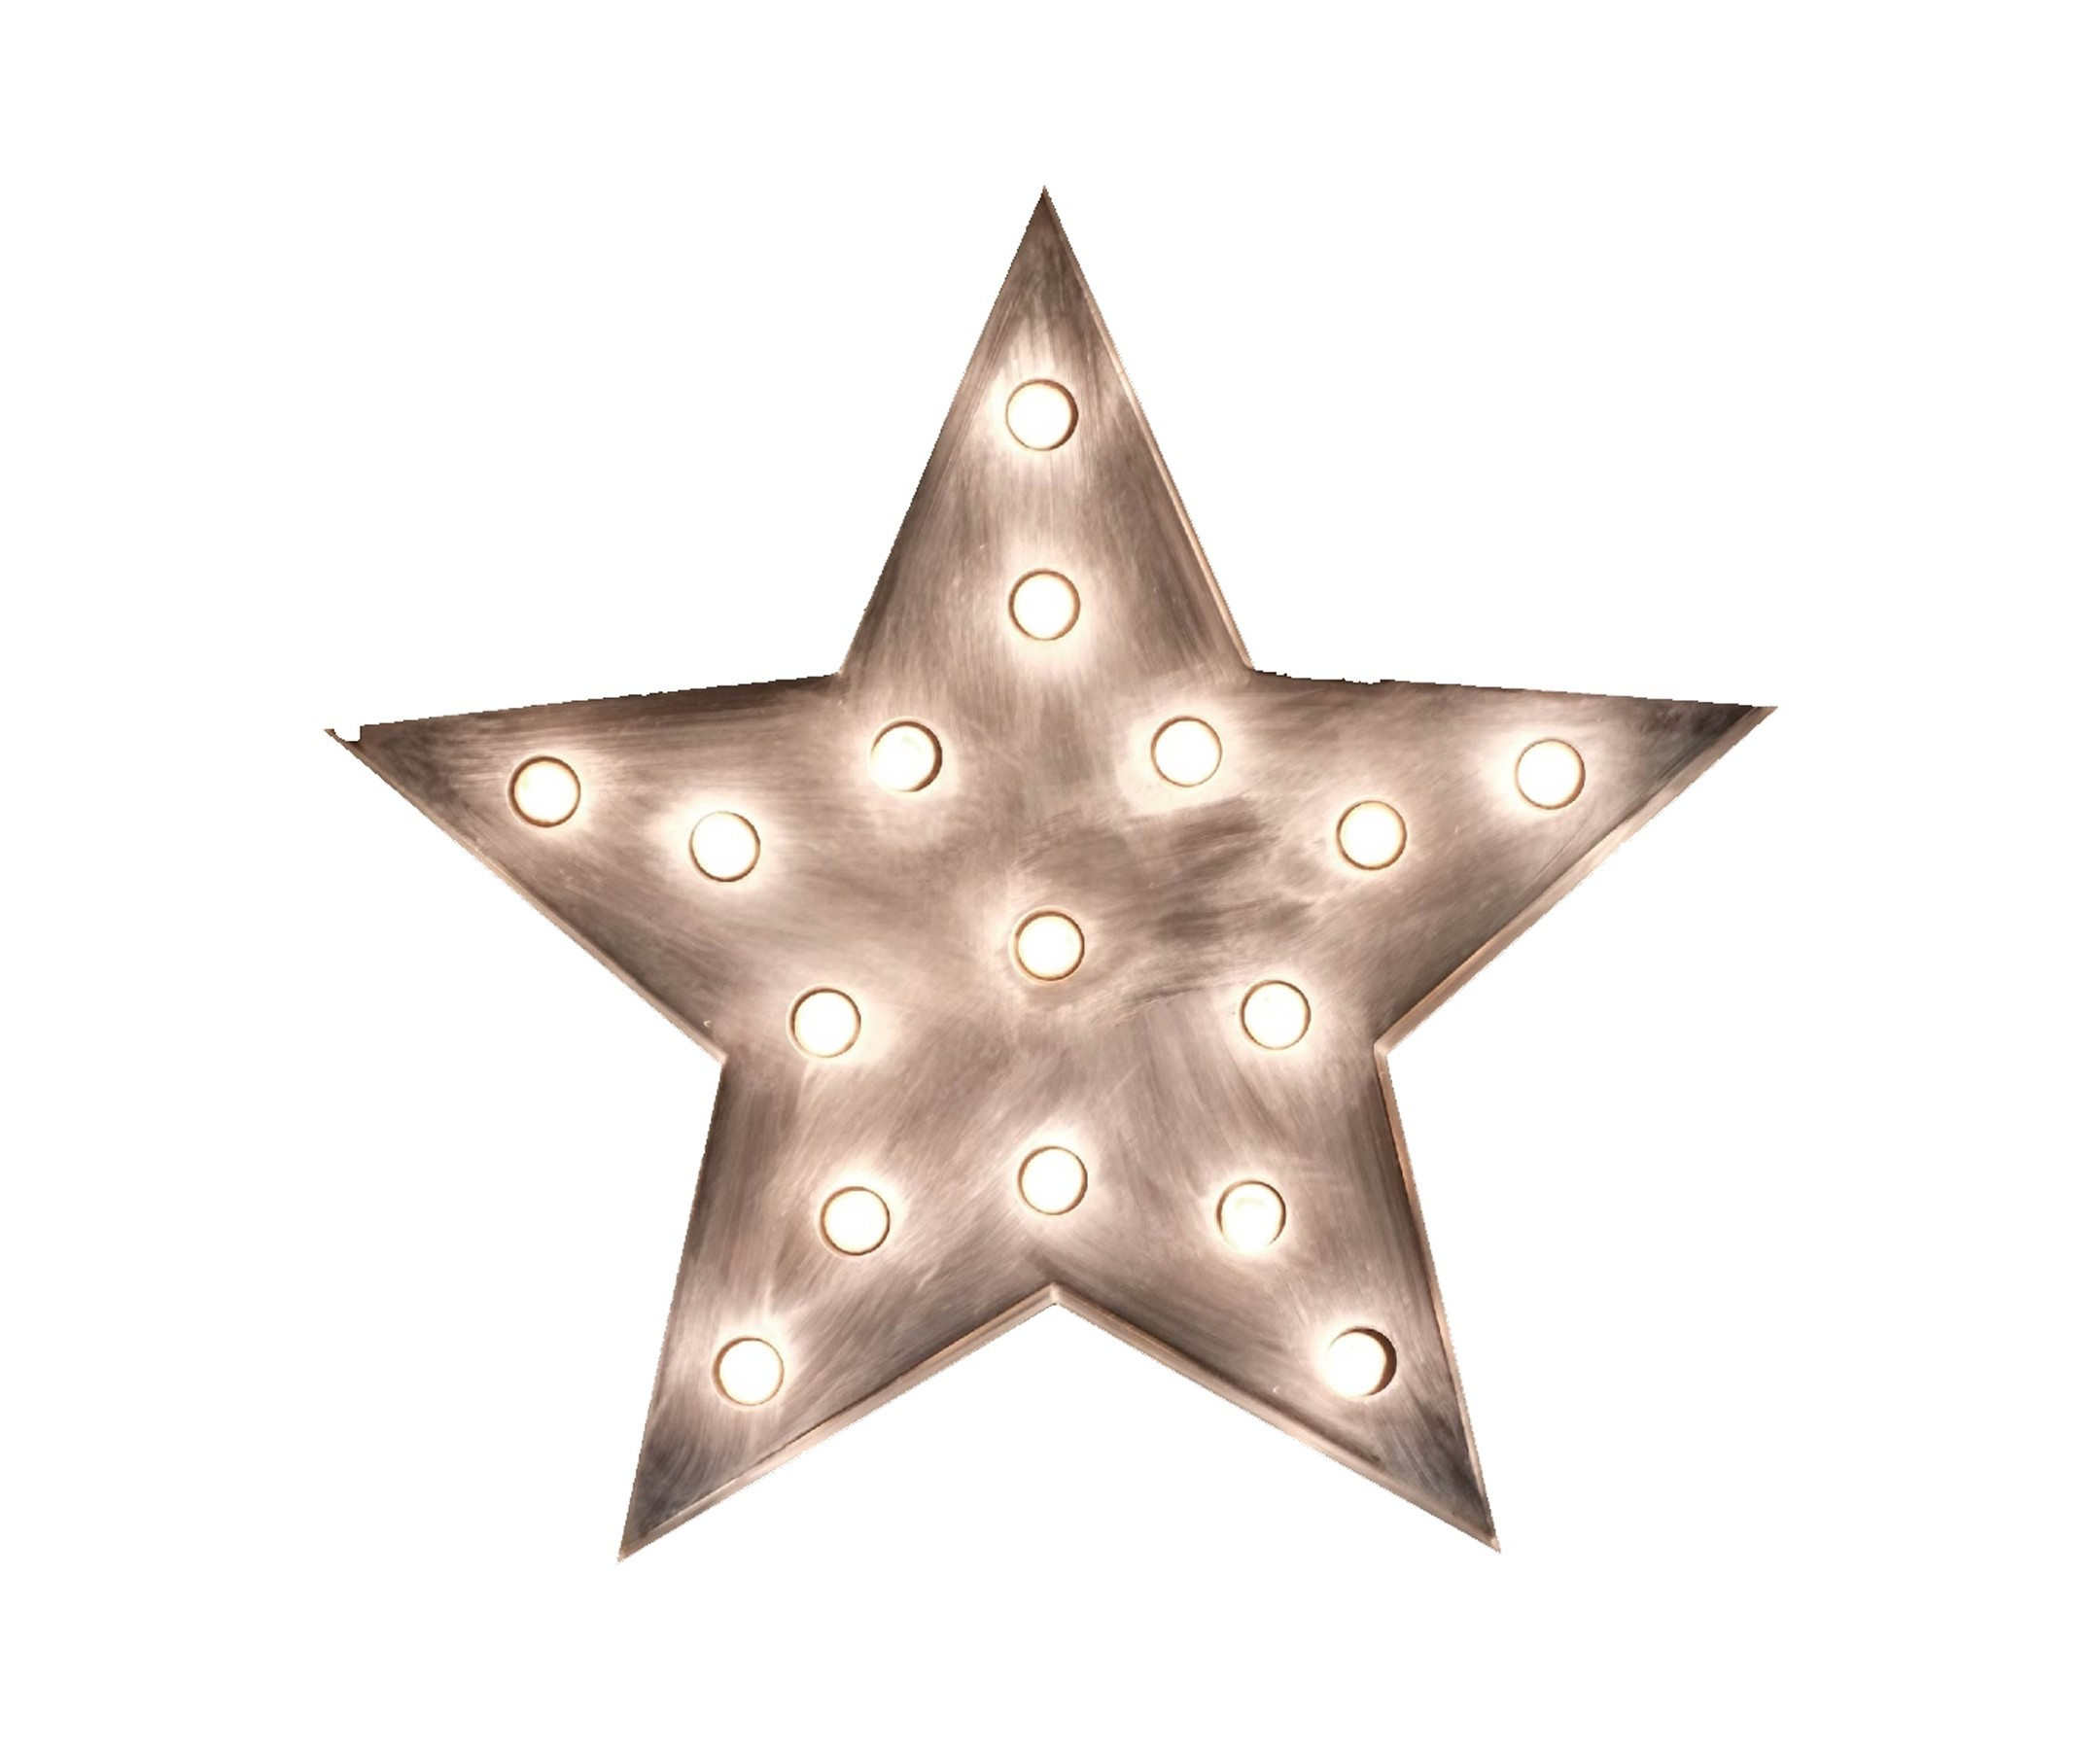 Настенный светильник ЗвездаБра<br>&amp;lt;div&amp;gt;Вид цоколя: Е27&amp;lt;/div&amp;gt;&amp;lt;div&amp;gt;Мощность: 60W&amp;lt;/div&amp;gt;&amp;lt;div&amp;gt;Количество ламп: 1&amp;lt;/div&amp;gt;&amp;lt;div&amp;gt;лампа в комплект не входит&amp;lt;/div&amp;gt;<br><br>Material: Металл<br>Ширина см: 57<br>Высота см: 55<br>Глубина см: 10